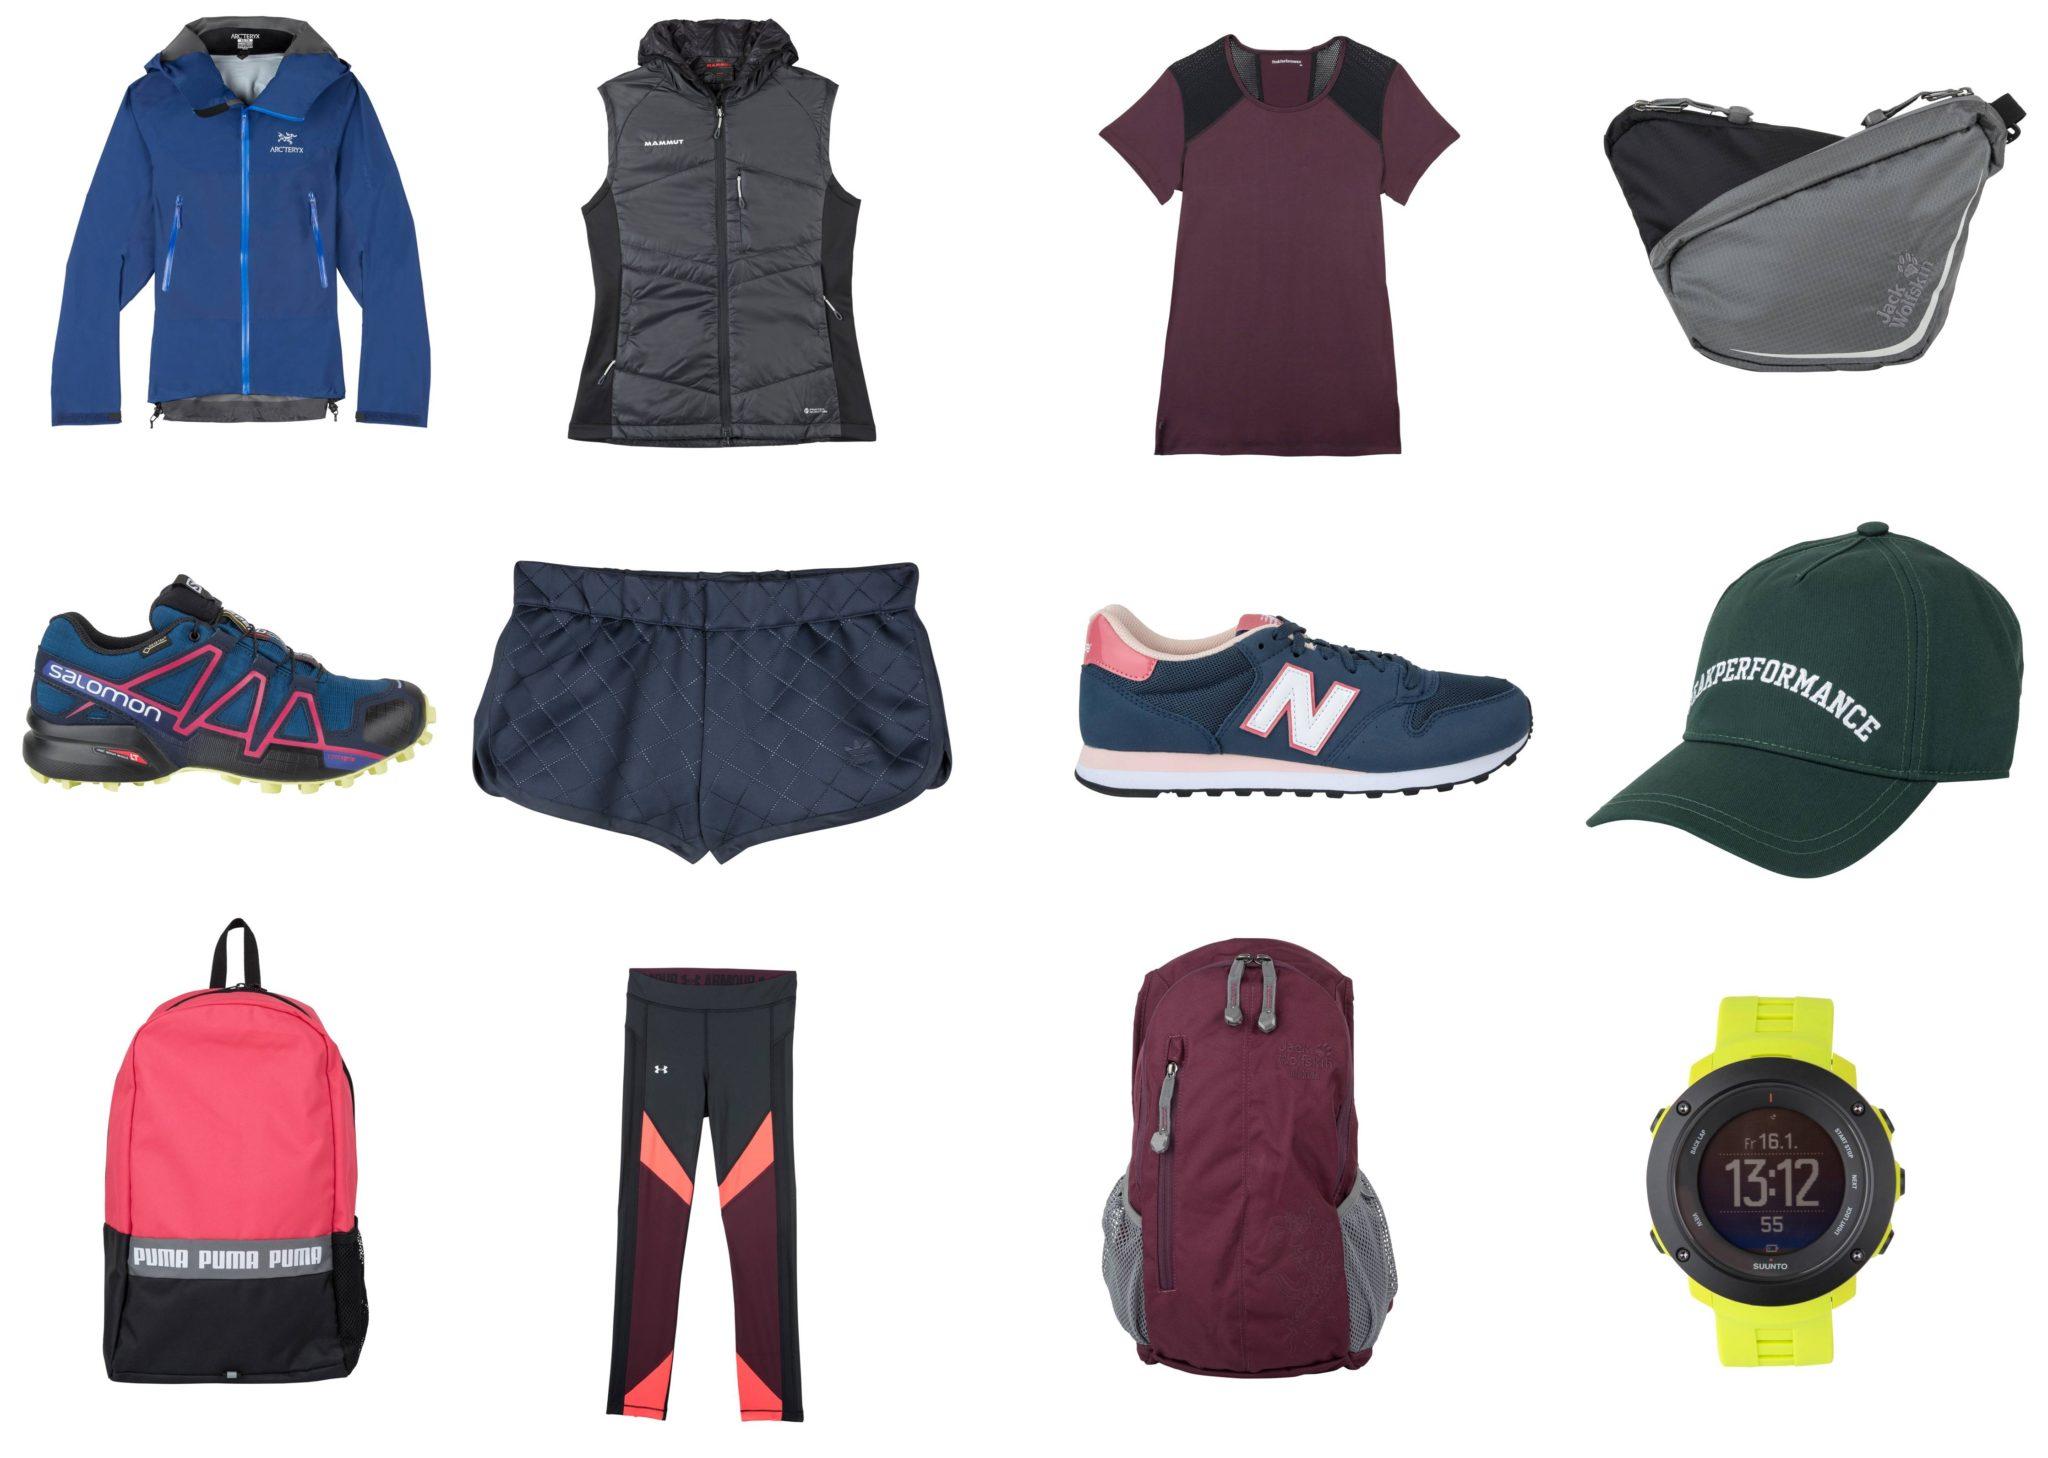 09caad2bc Hľadáte športový vzhľad pre štýlový tréning? Zaostrite na trendové športové  oblečenie z McArthurGlen Designer Outlet Parndorf!!!